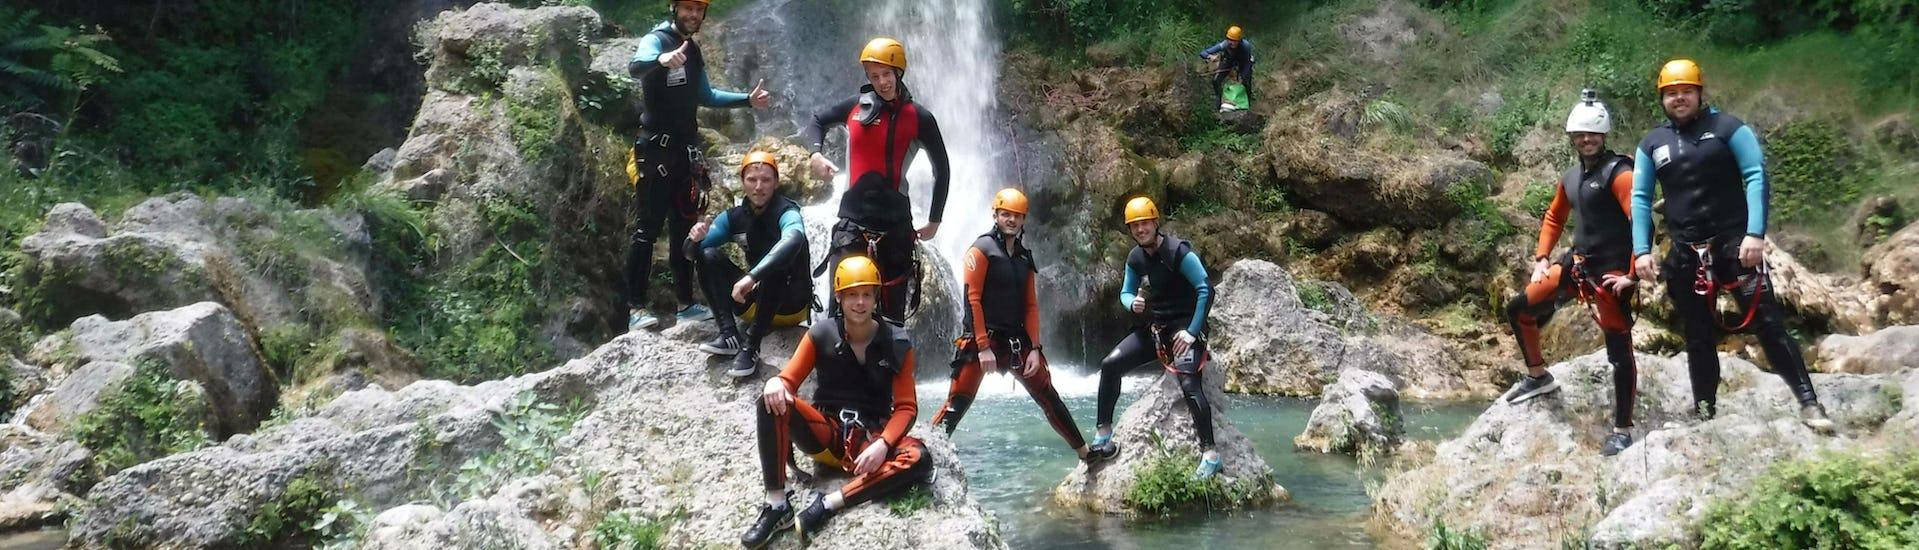 Canyoning for Beginners - Barranco Gorgo de la Escalera